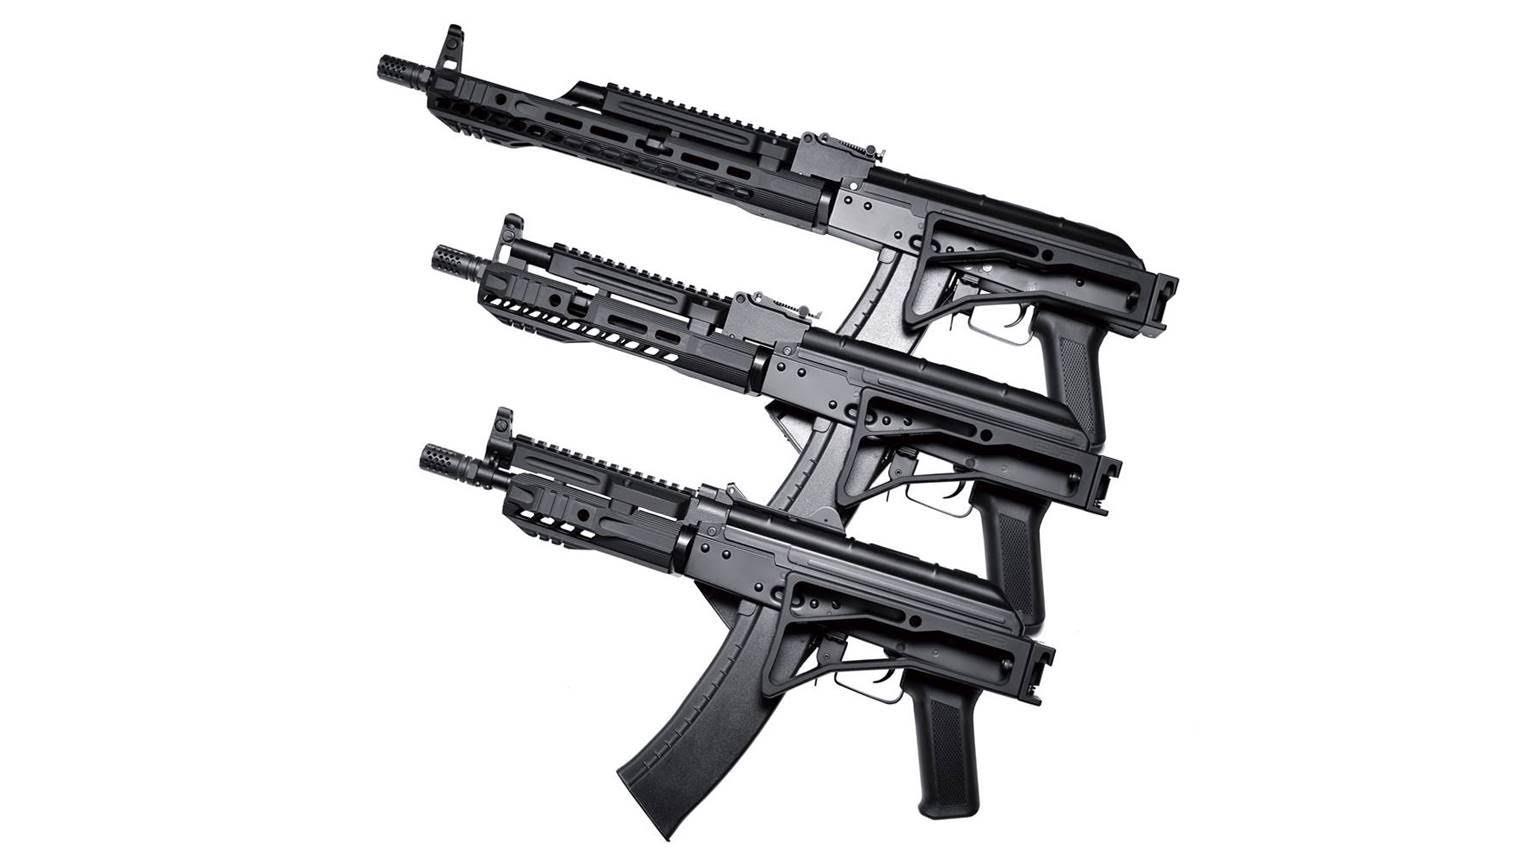 Sharps Bros x SLR MB47 AK series @DyTac